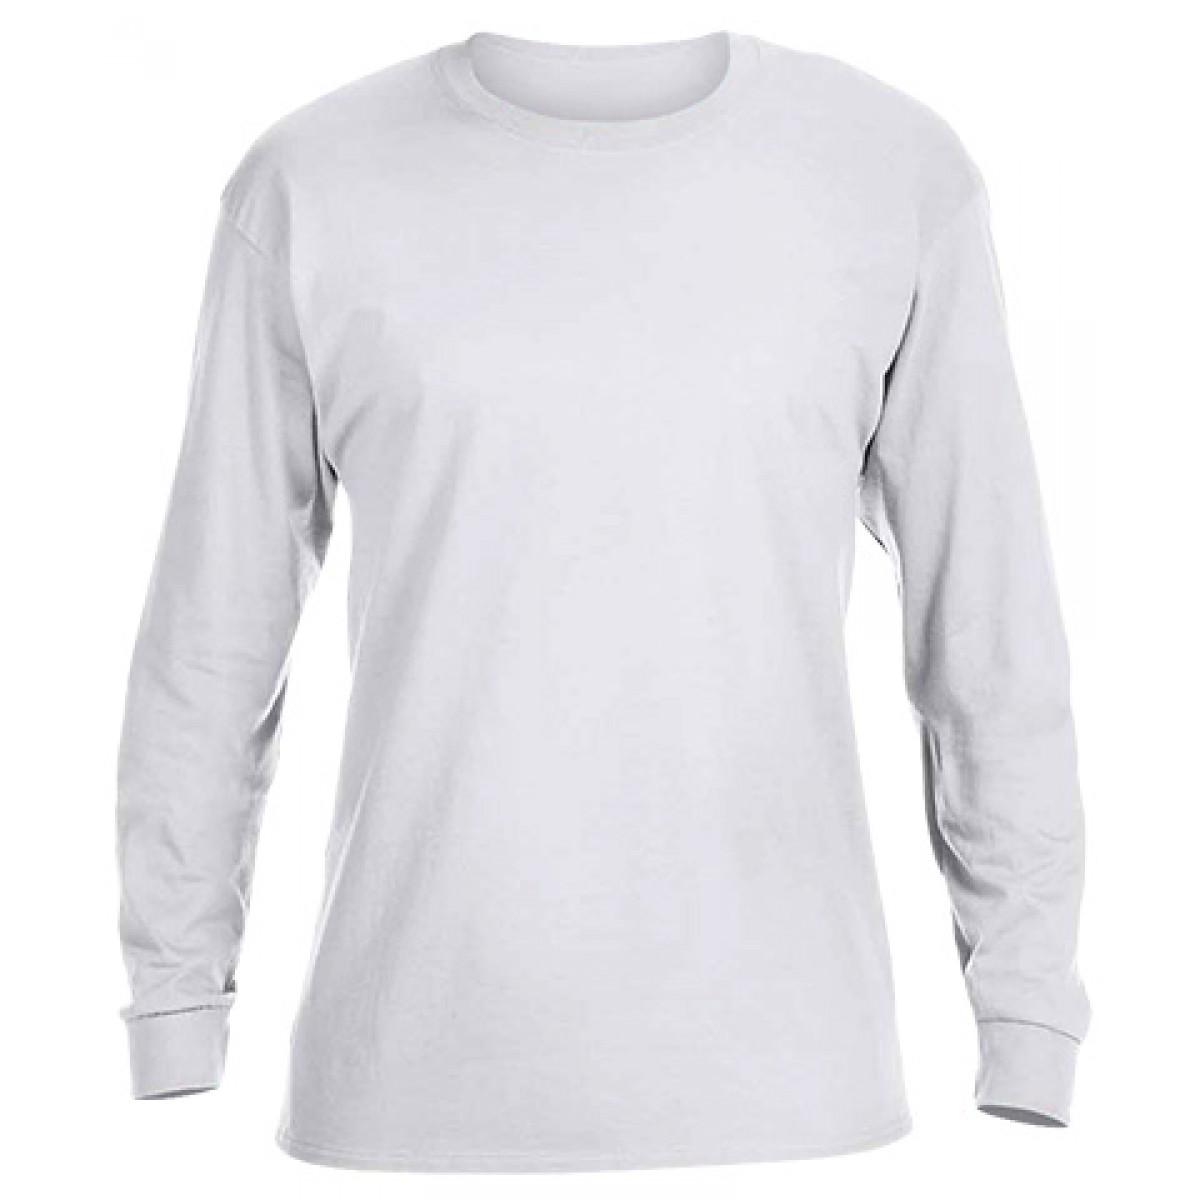 Ultra Cotton Long-Sleeve T-Shirt-White-XS